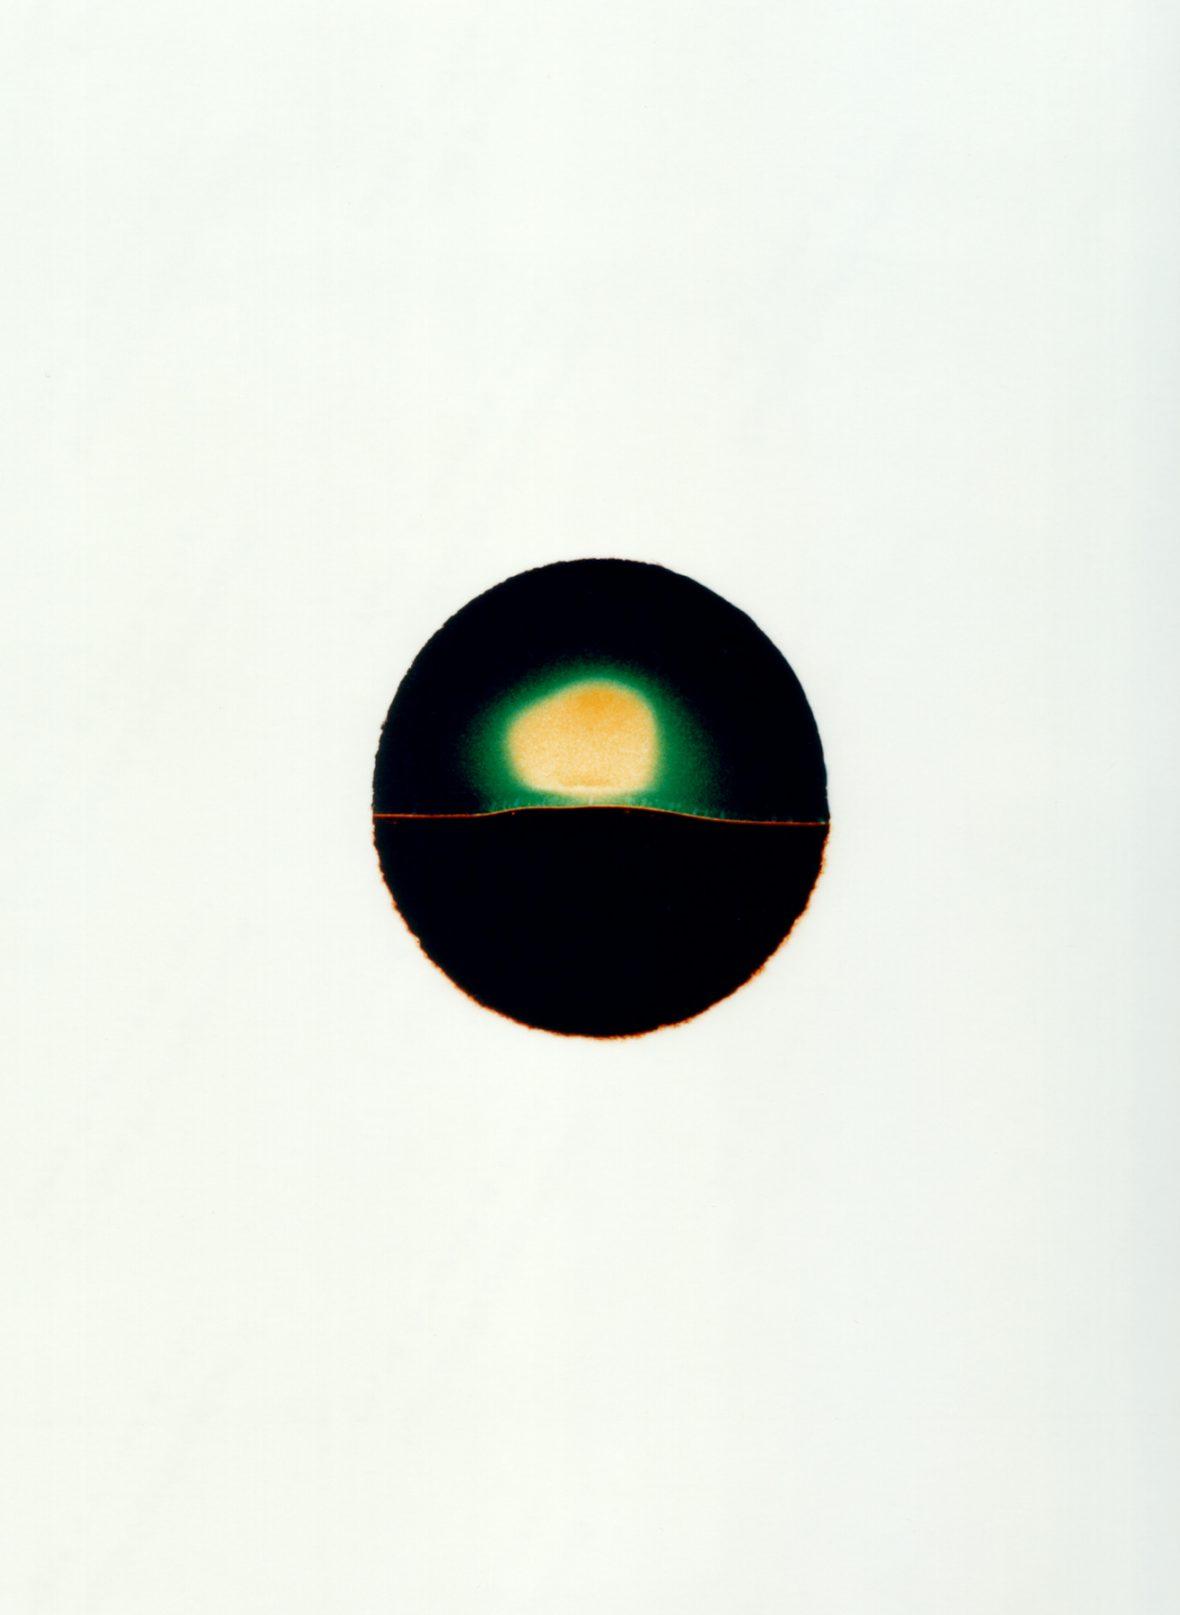 Ränder, 2003, C-print, 40x30cm, Unikat